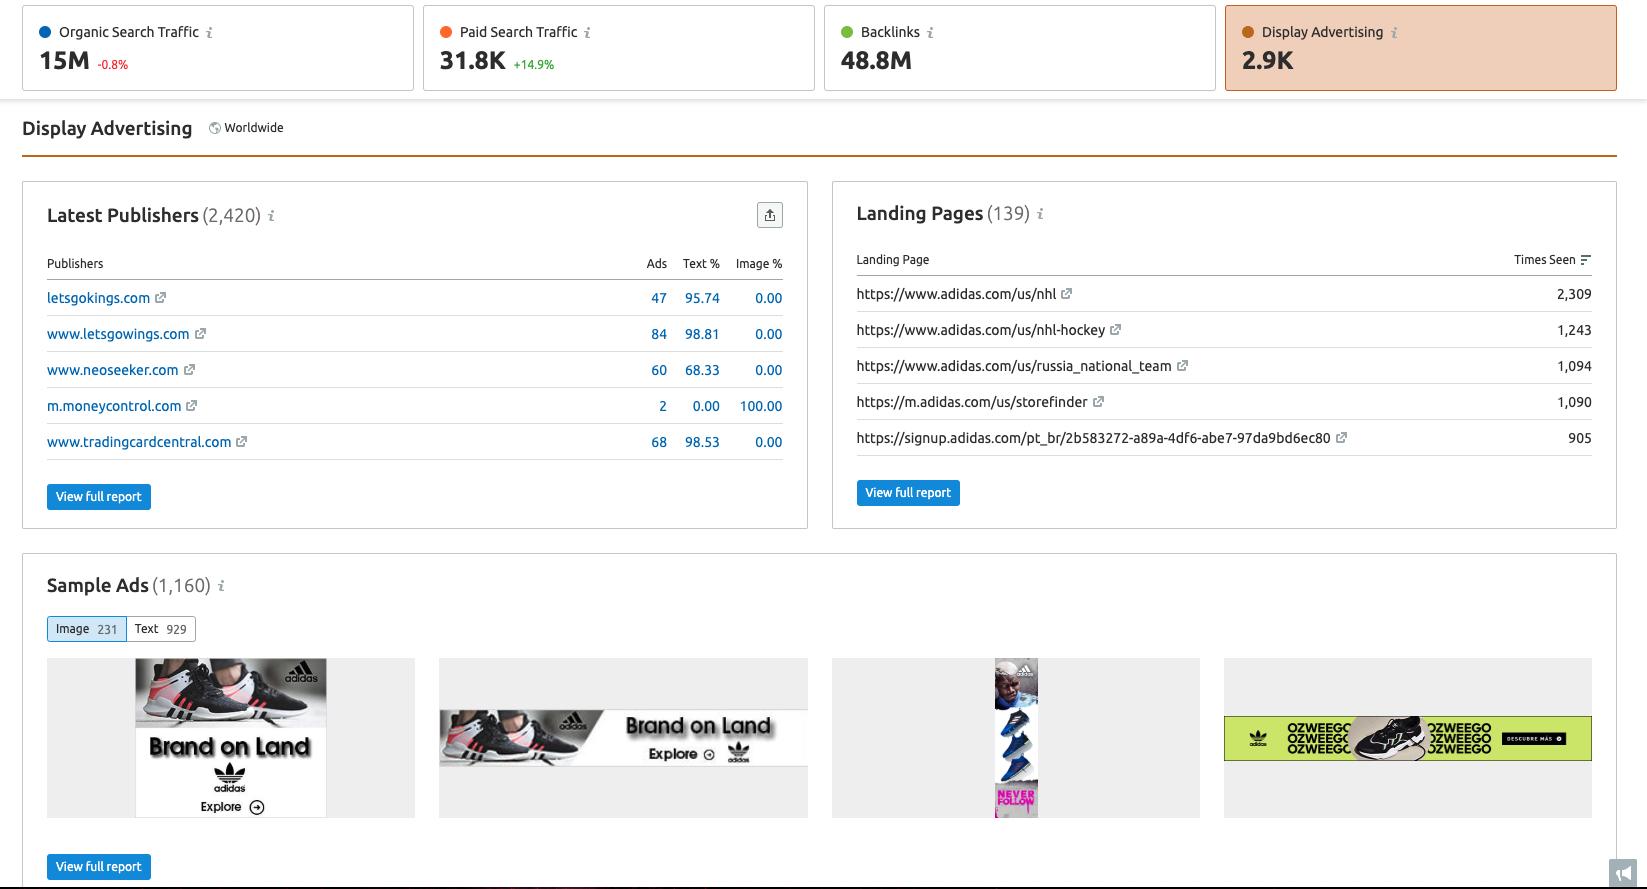 Domain Overview - Desktop image 5